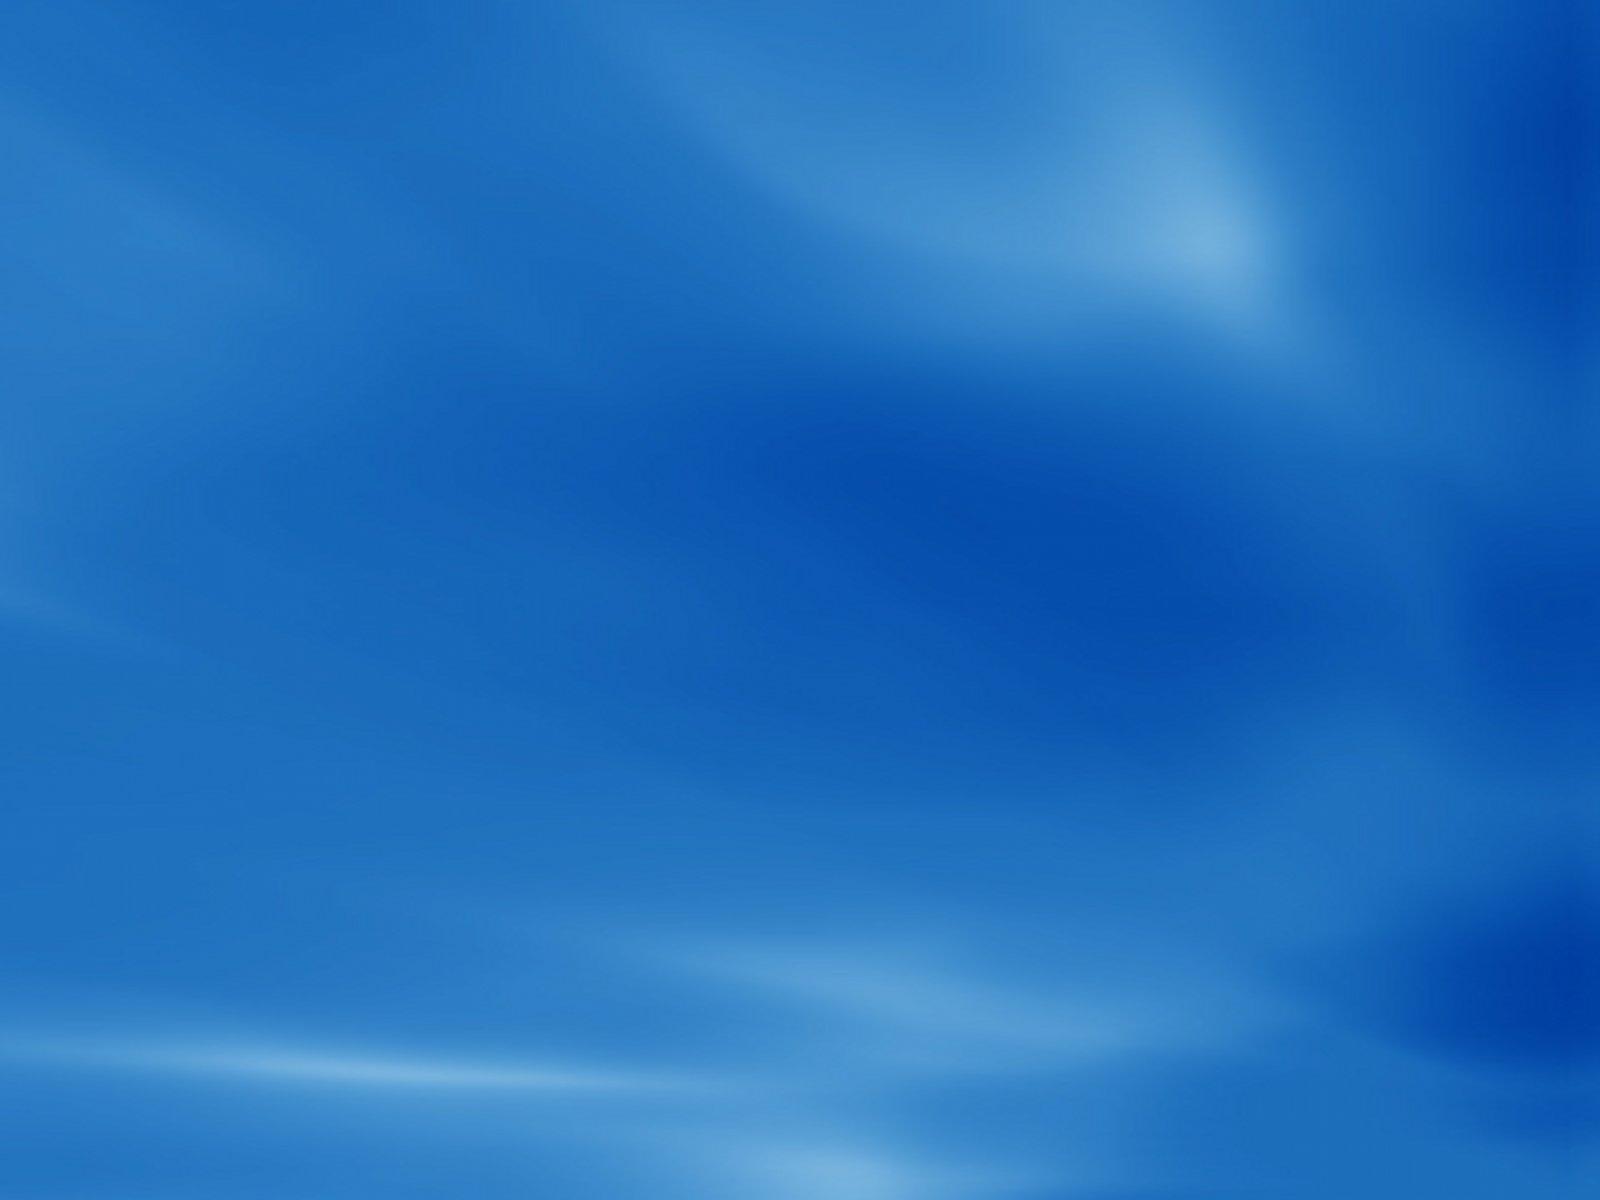 sky blue sky bl... Sky